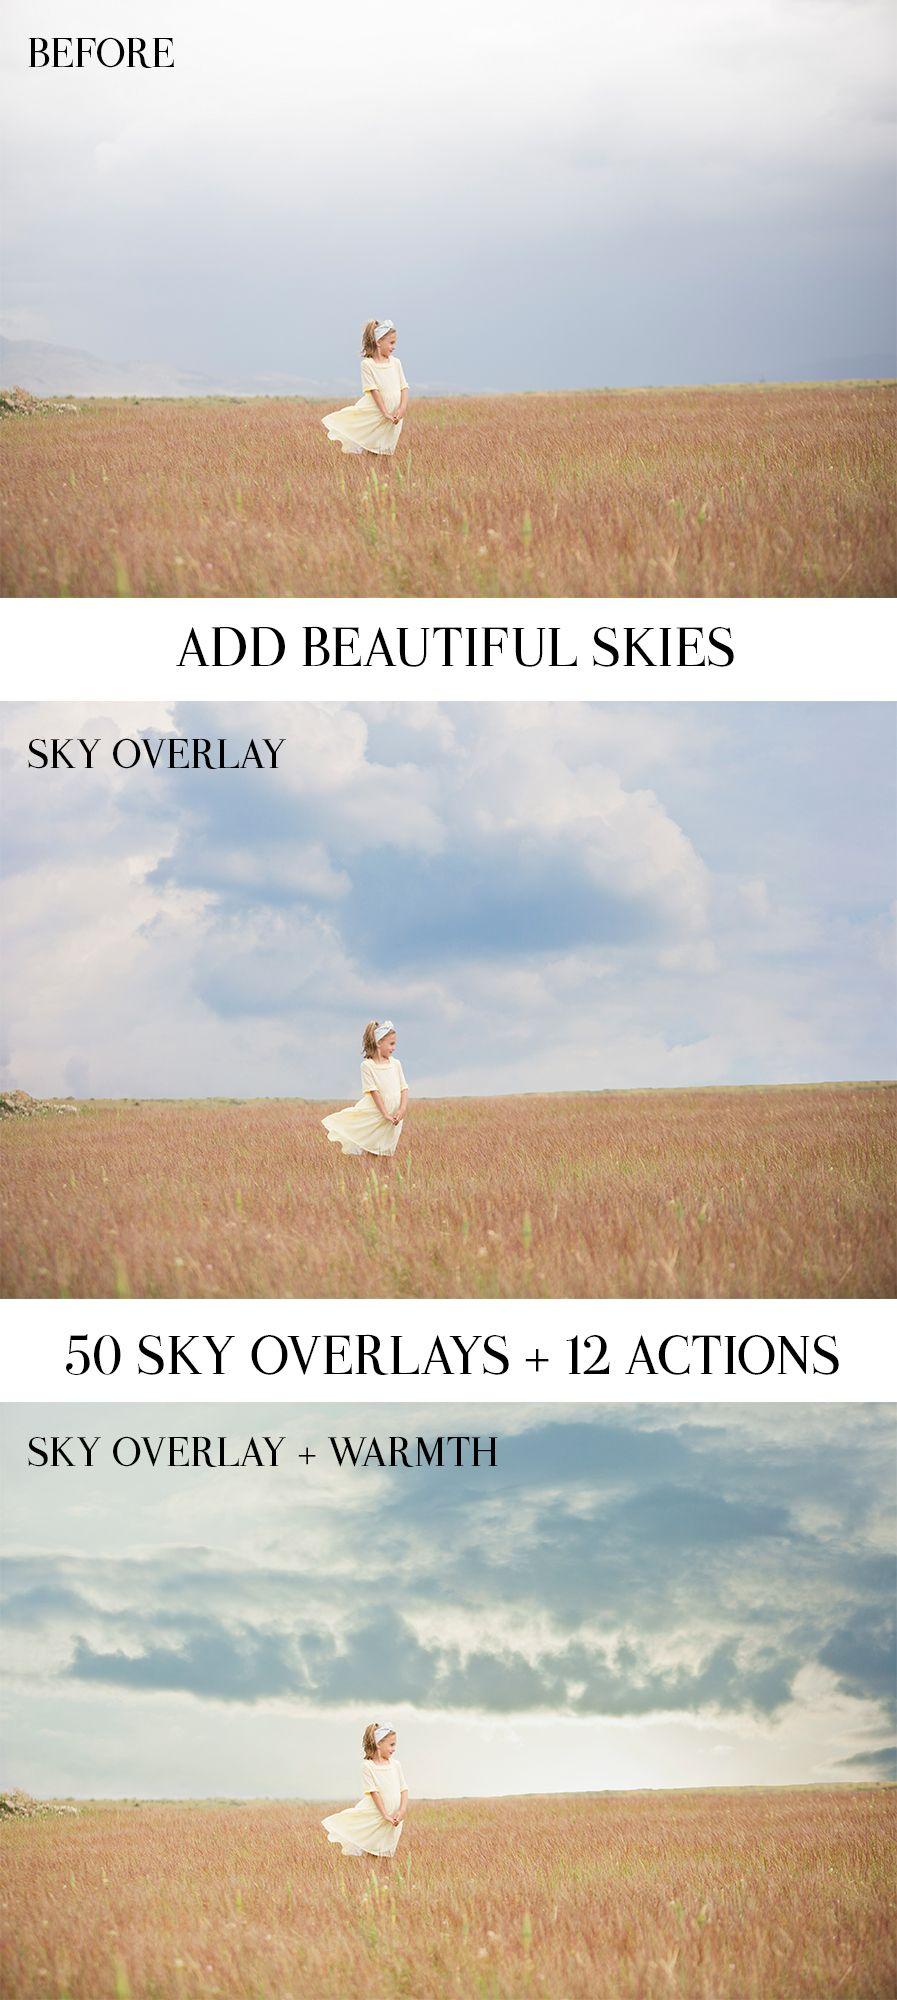 Lighting and Skies Bundle- $85 - Elyana Ivette Photoshop Actions and Lightroom Presets